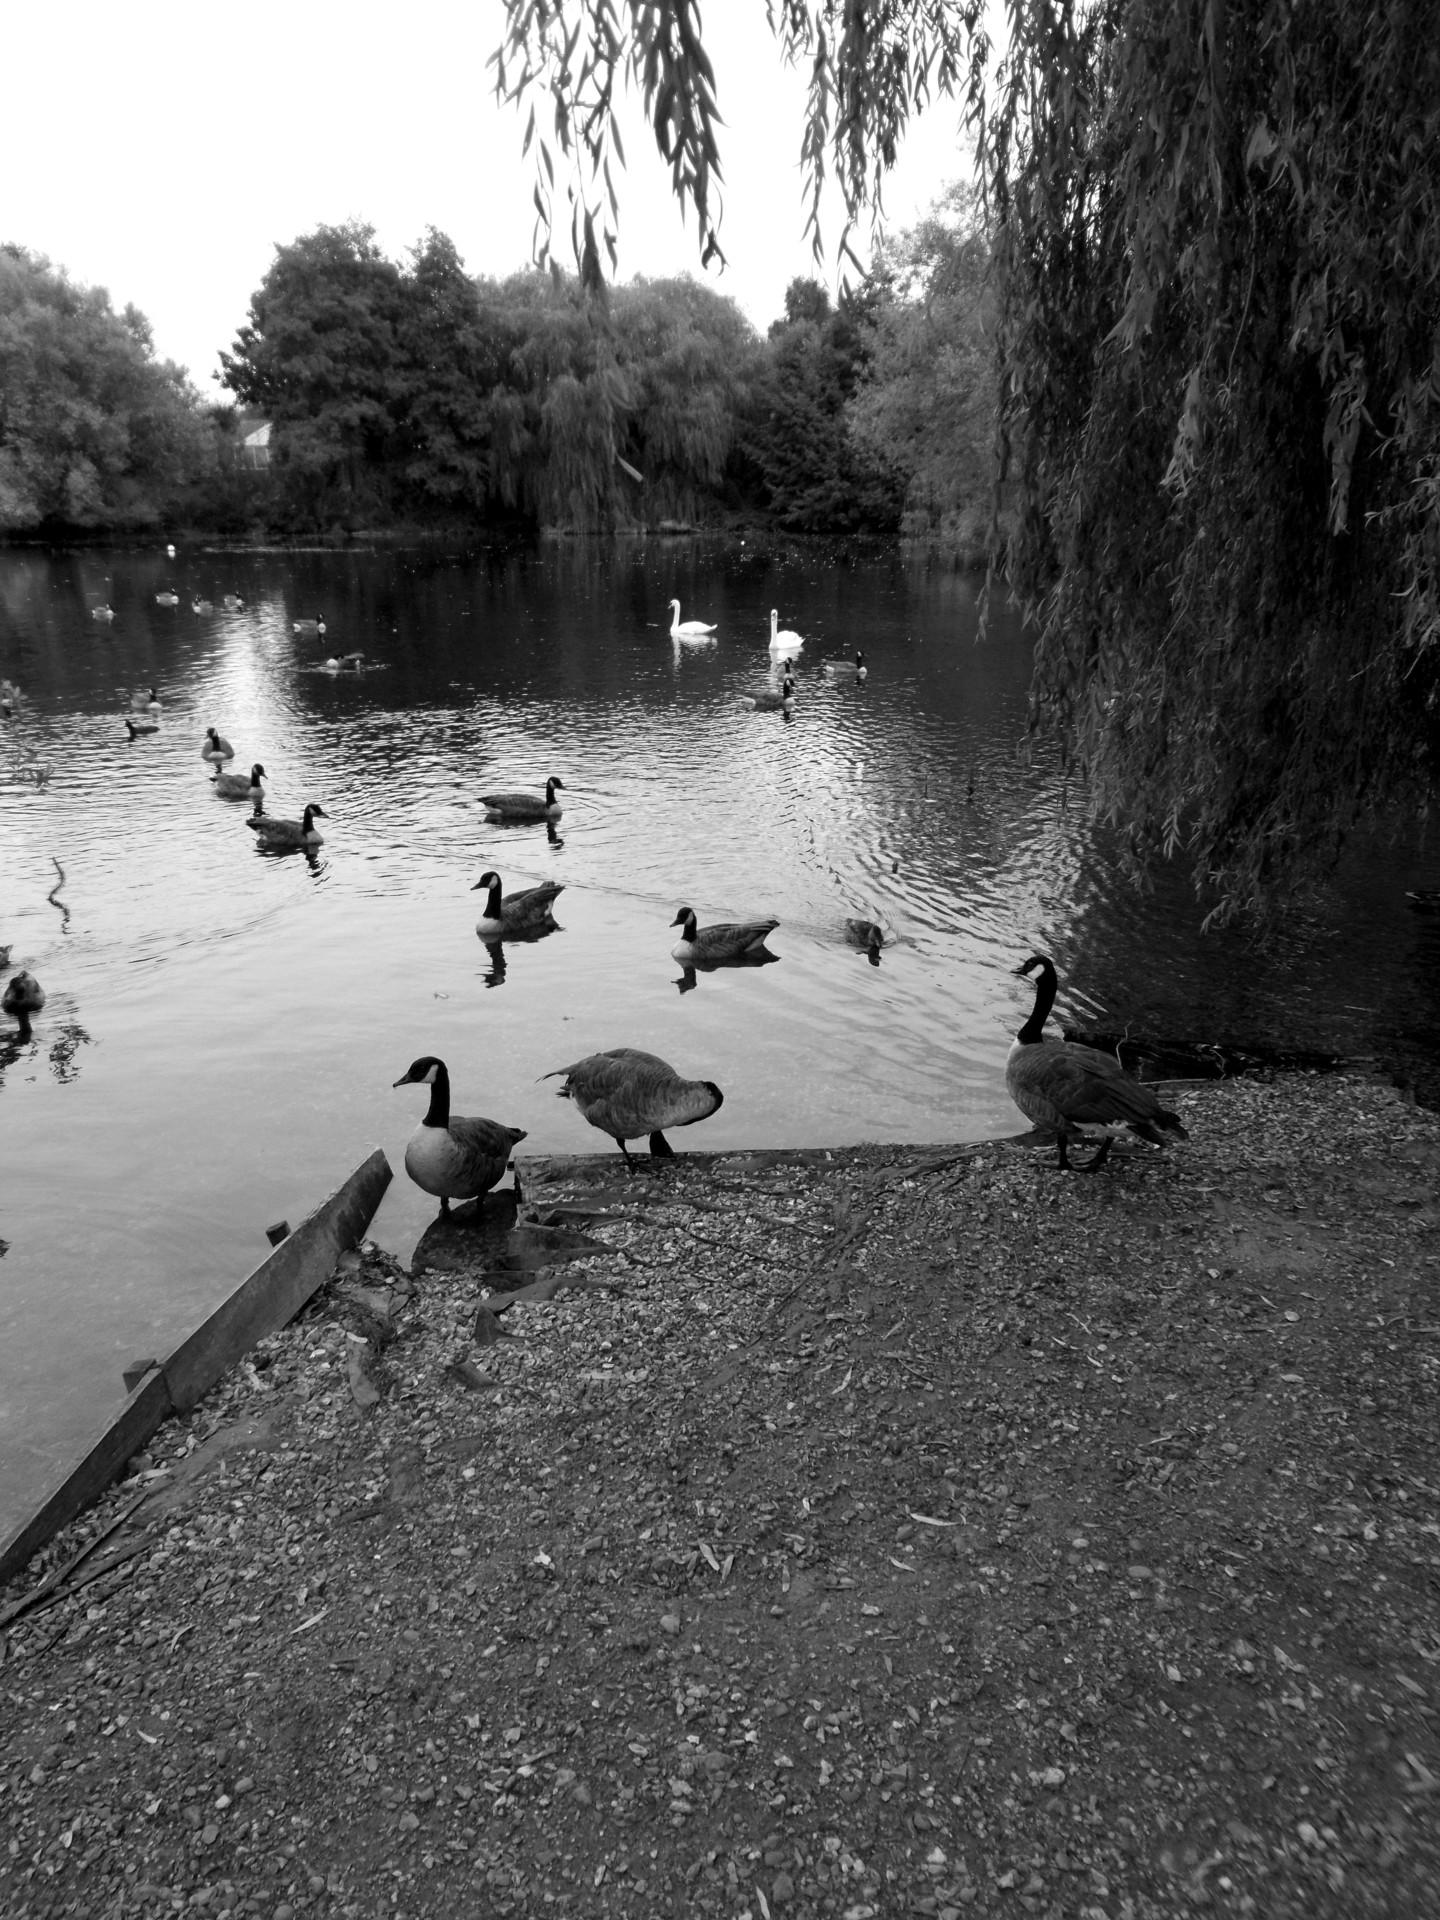 Gerald Shepherd - Composition With Birds